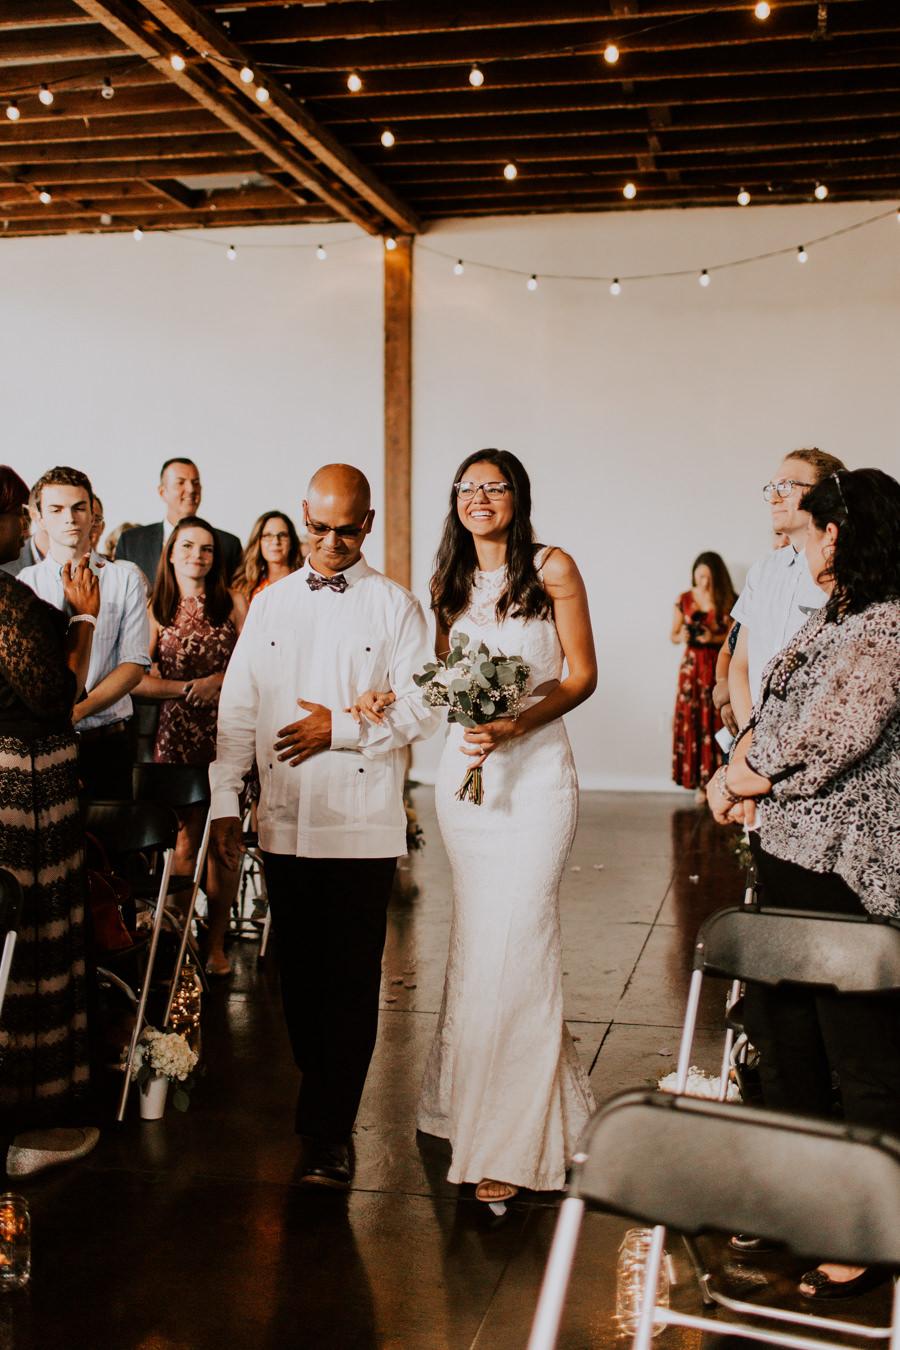 Tampa Heights Industrial Wedding at Cavu Emmy RJ-58.jpg